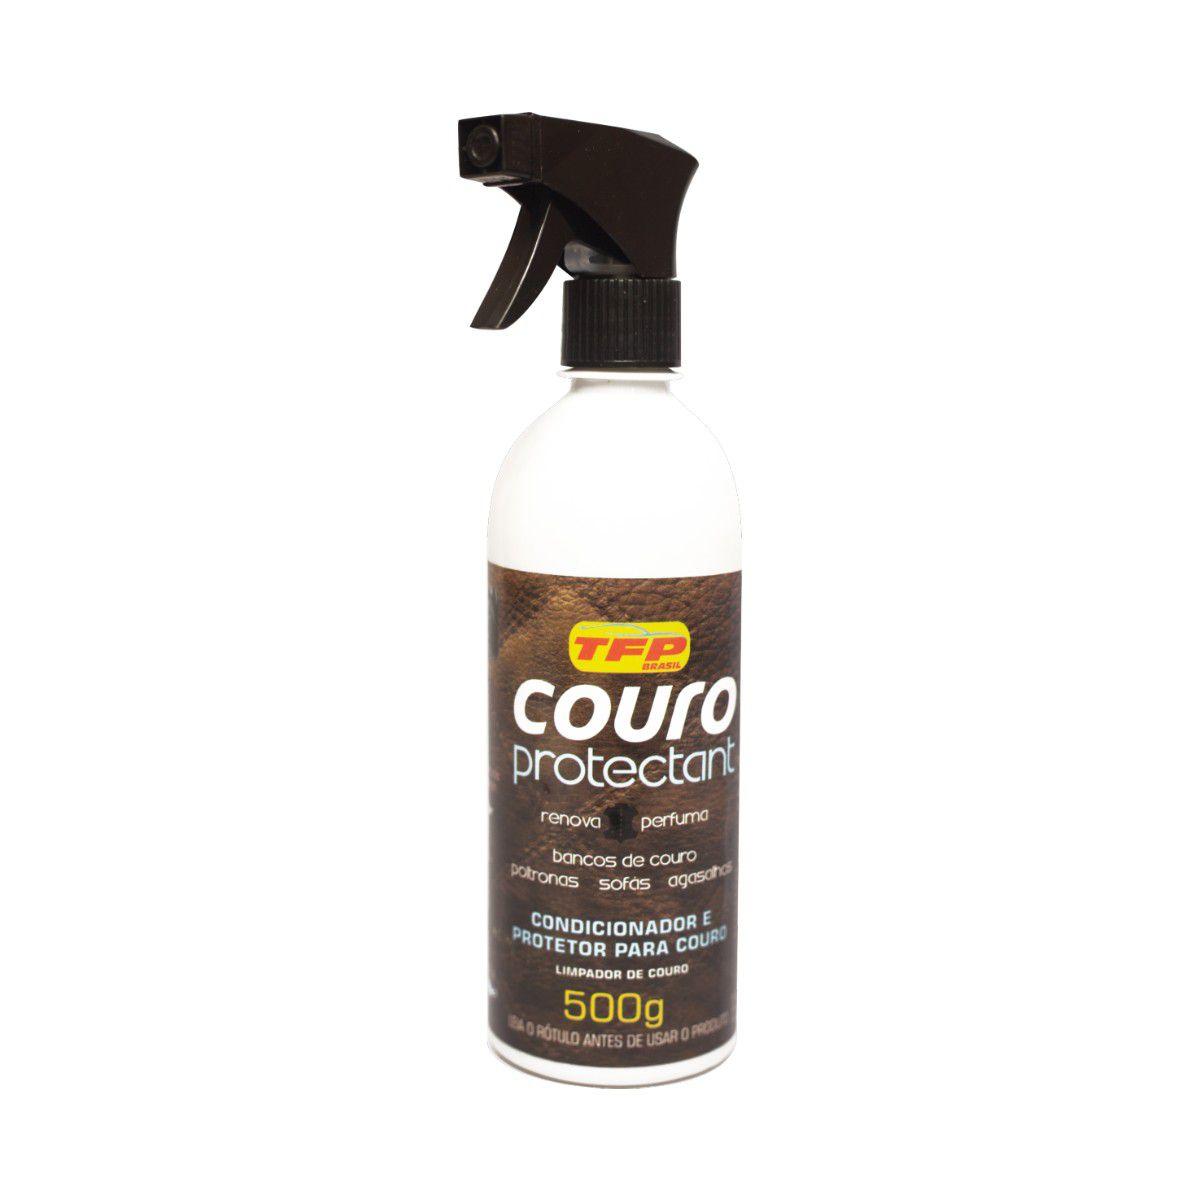 Condicionador Protetor Couro Protectant Tfp